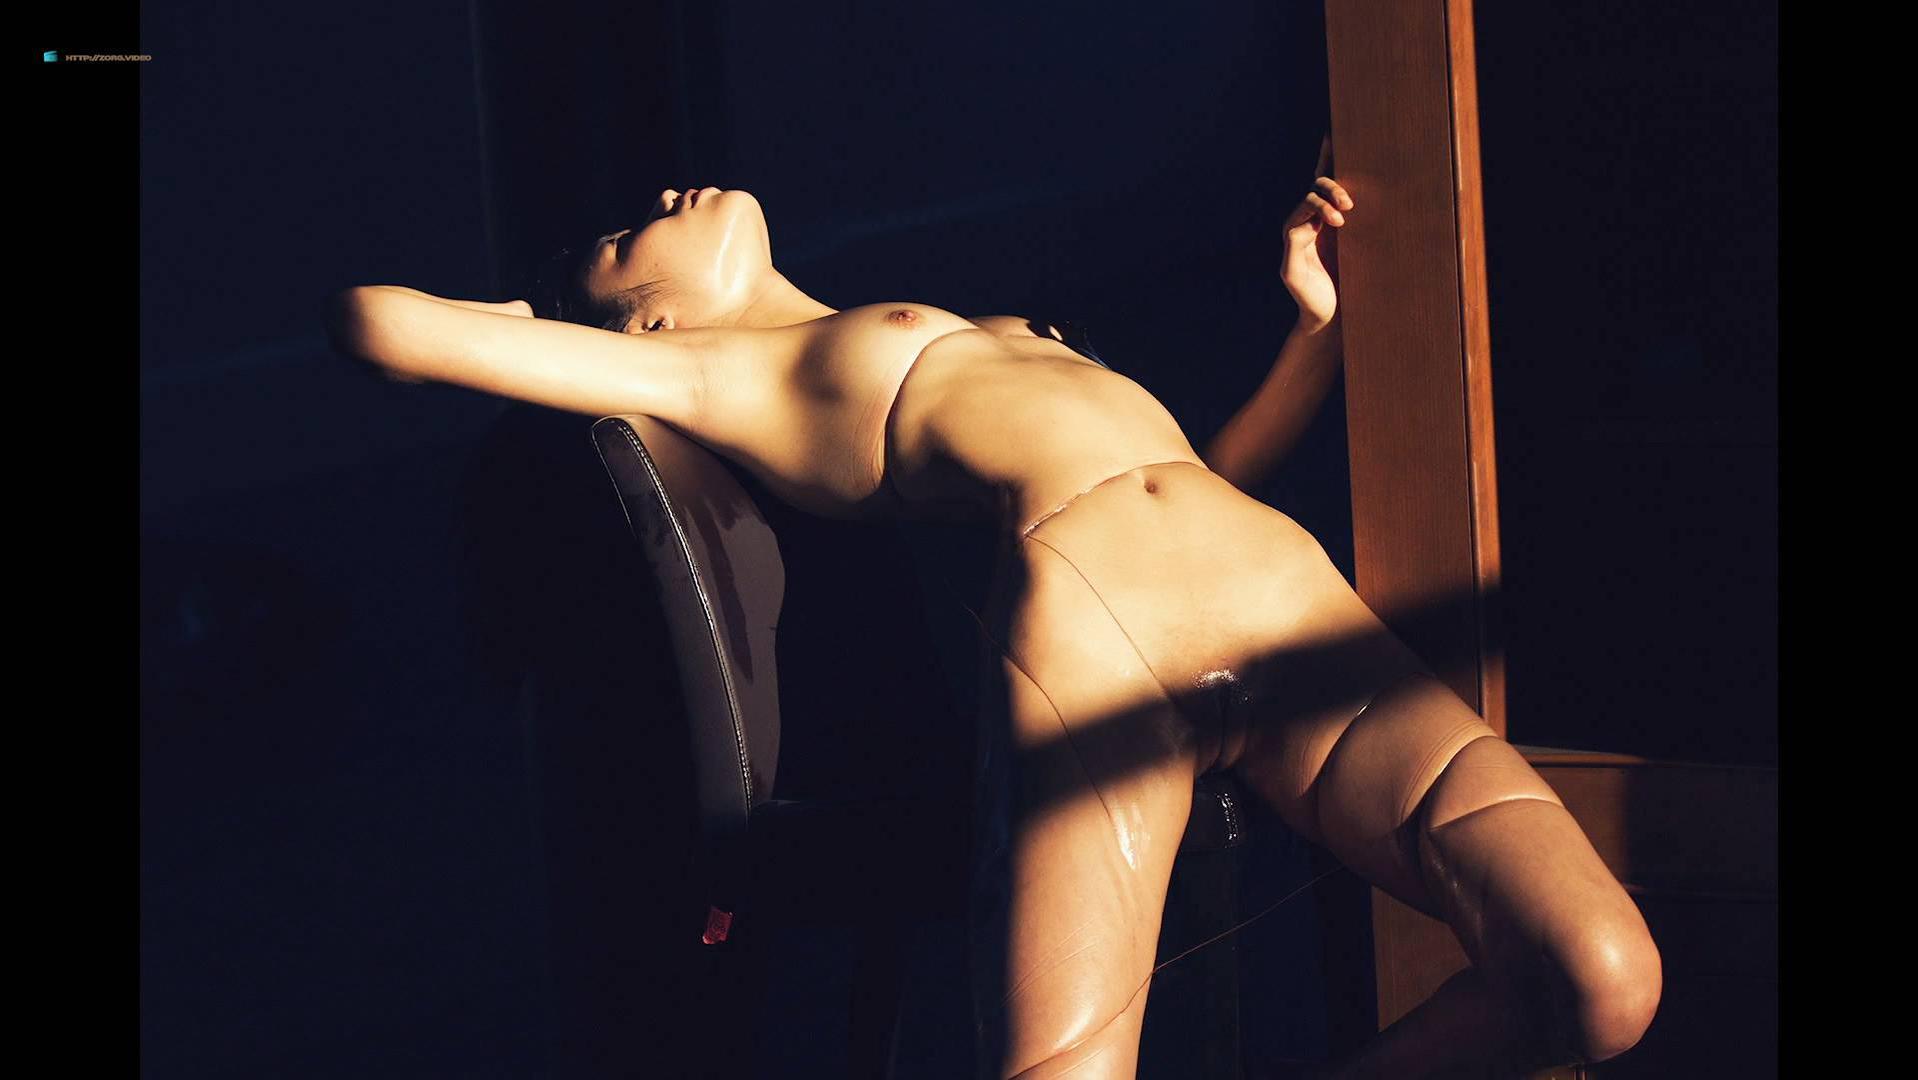 Rachel Cook nude, Jessica Clements nude, Ebonee Davis nude - Nude (2017)